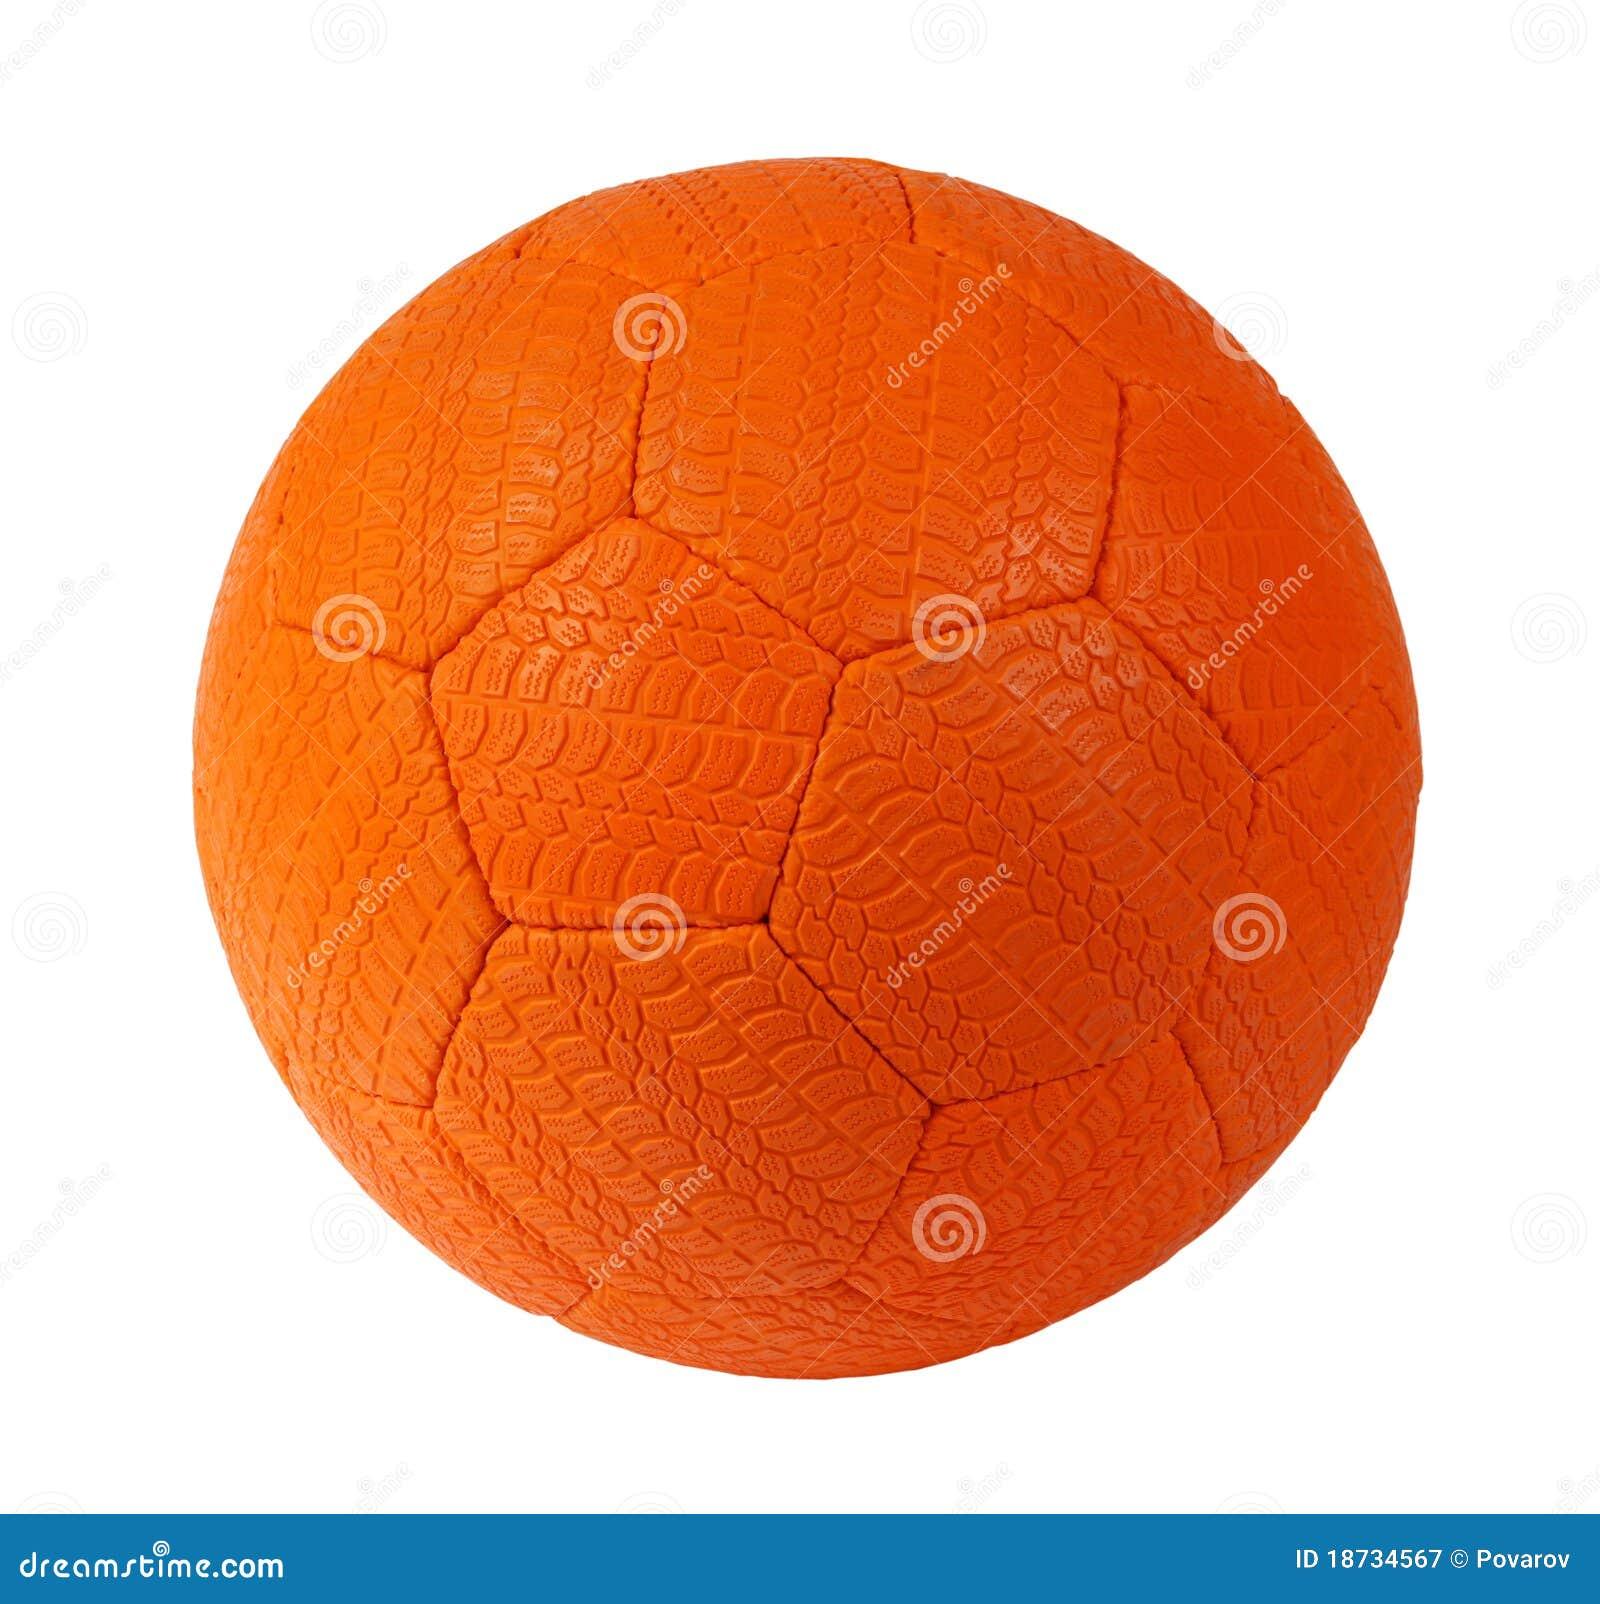 orange soccer ball stock image image of orange football 18734567